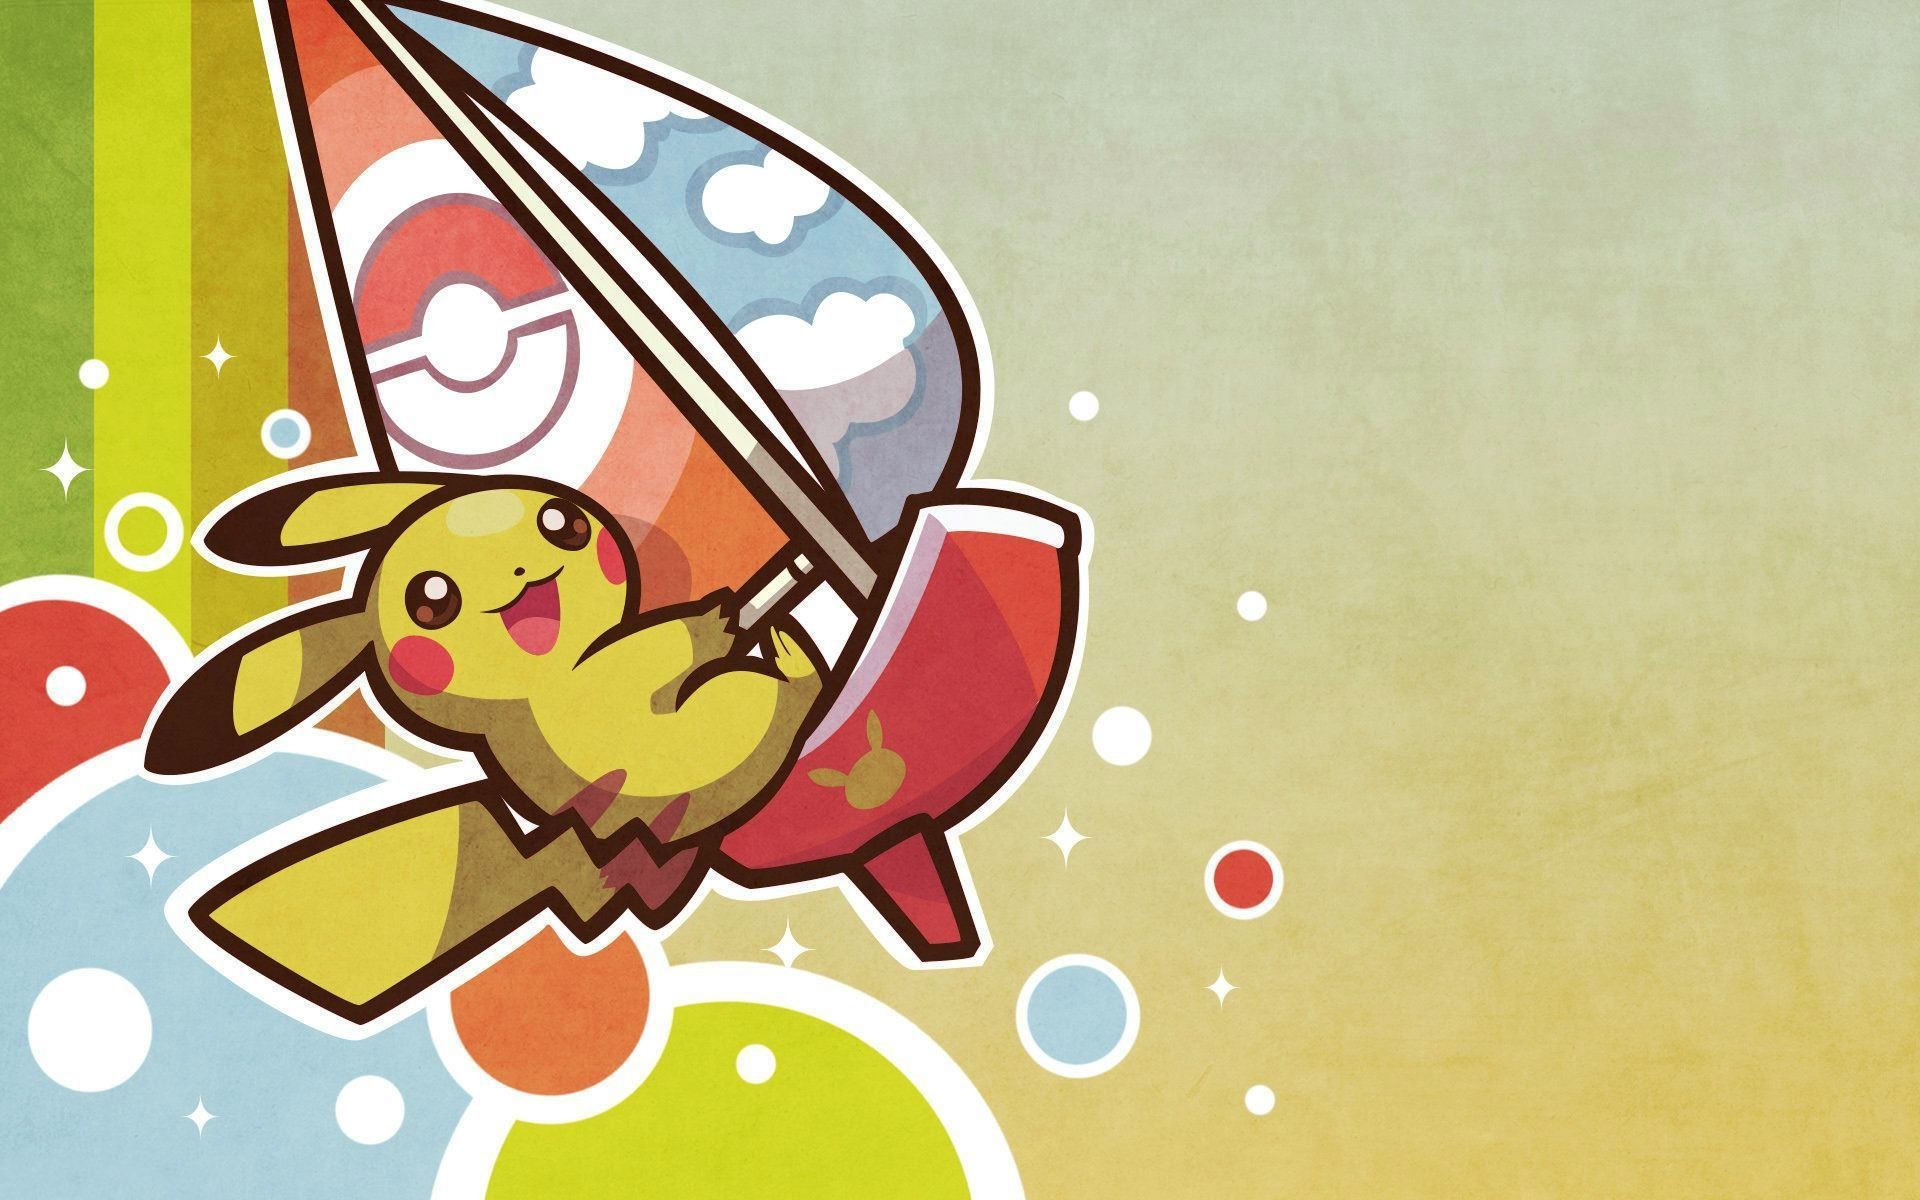 Res: 1920x1200, cute pokemon wallpaper images